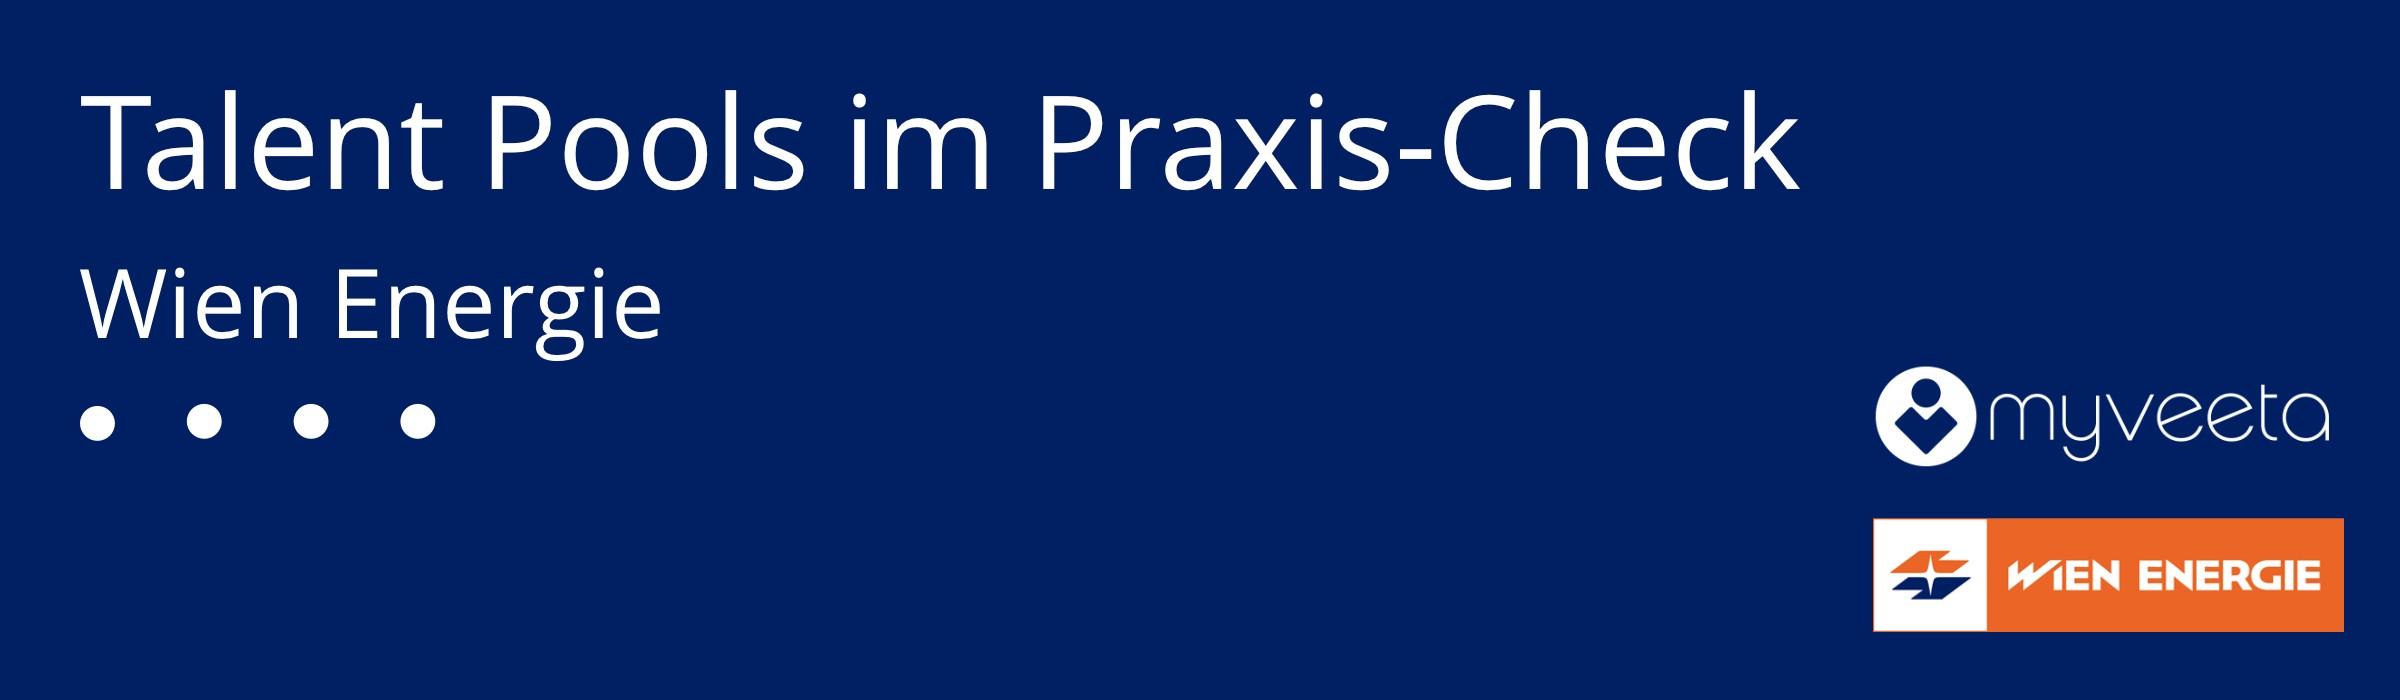 Banner_Talent Pools im Praxis-Check_Wien Energie